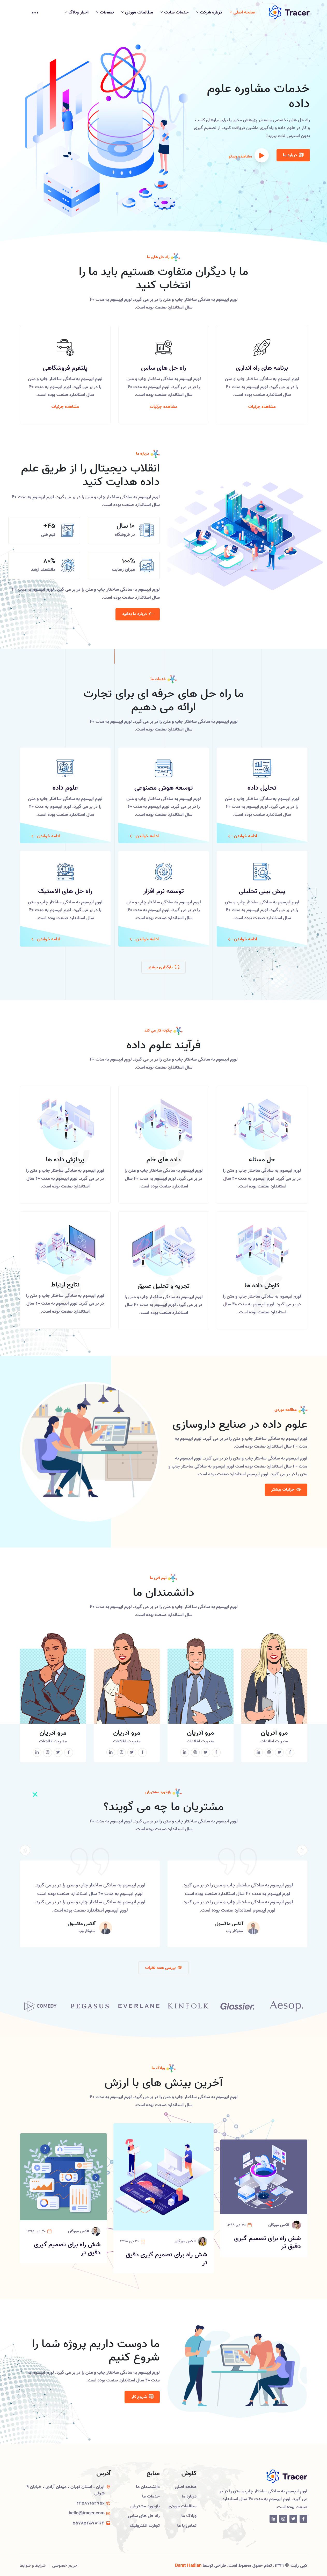 قالب HTML Tracer ، پوسته شرکتی فناوری IT و خدمات دیجیتال تریسر